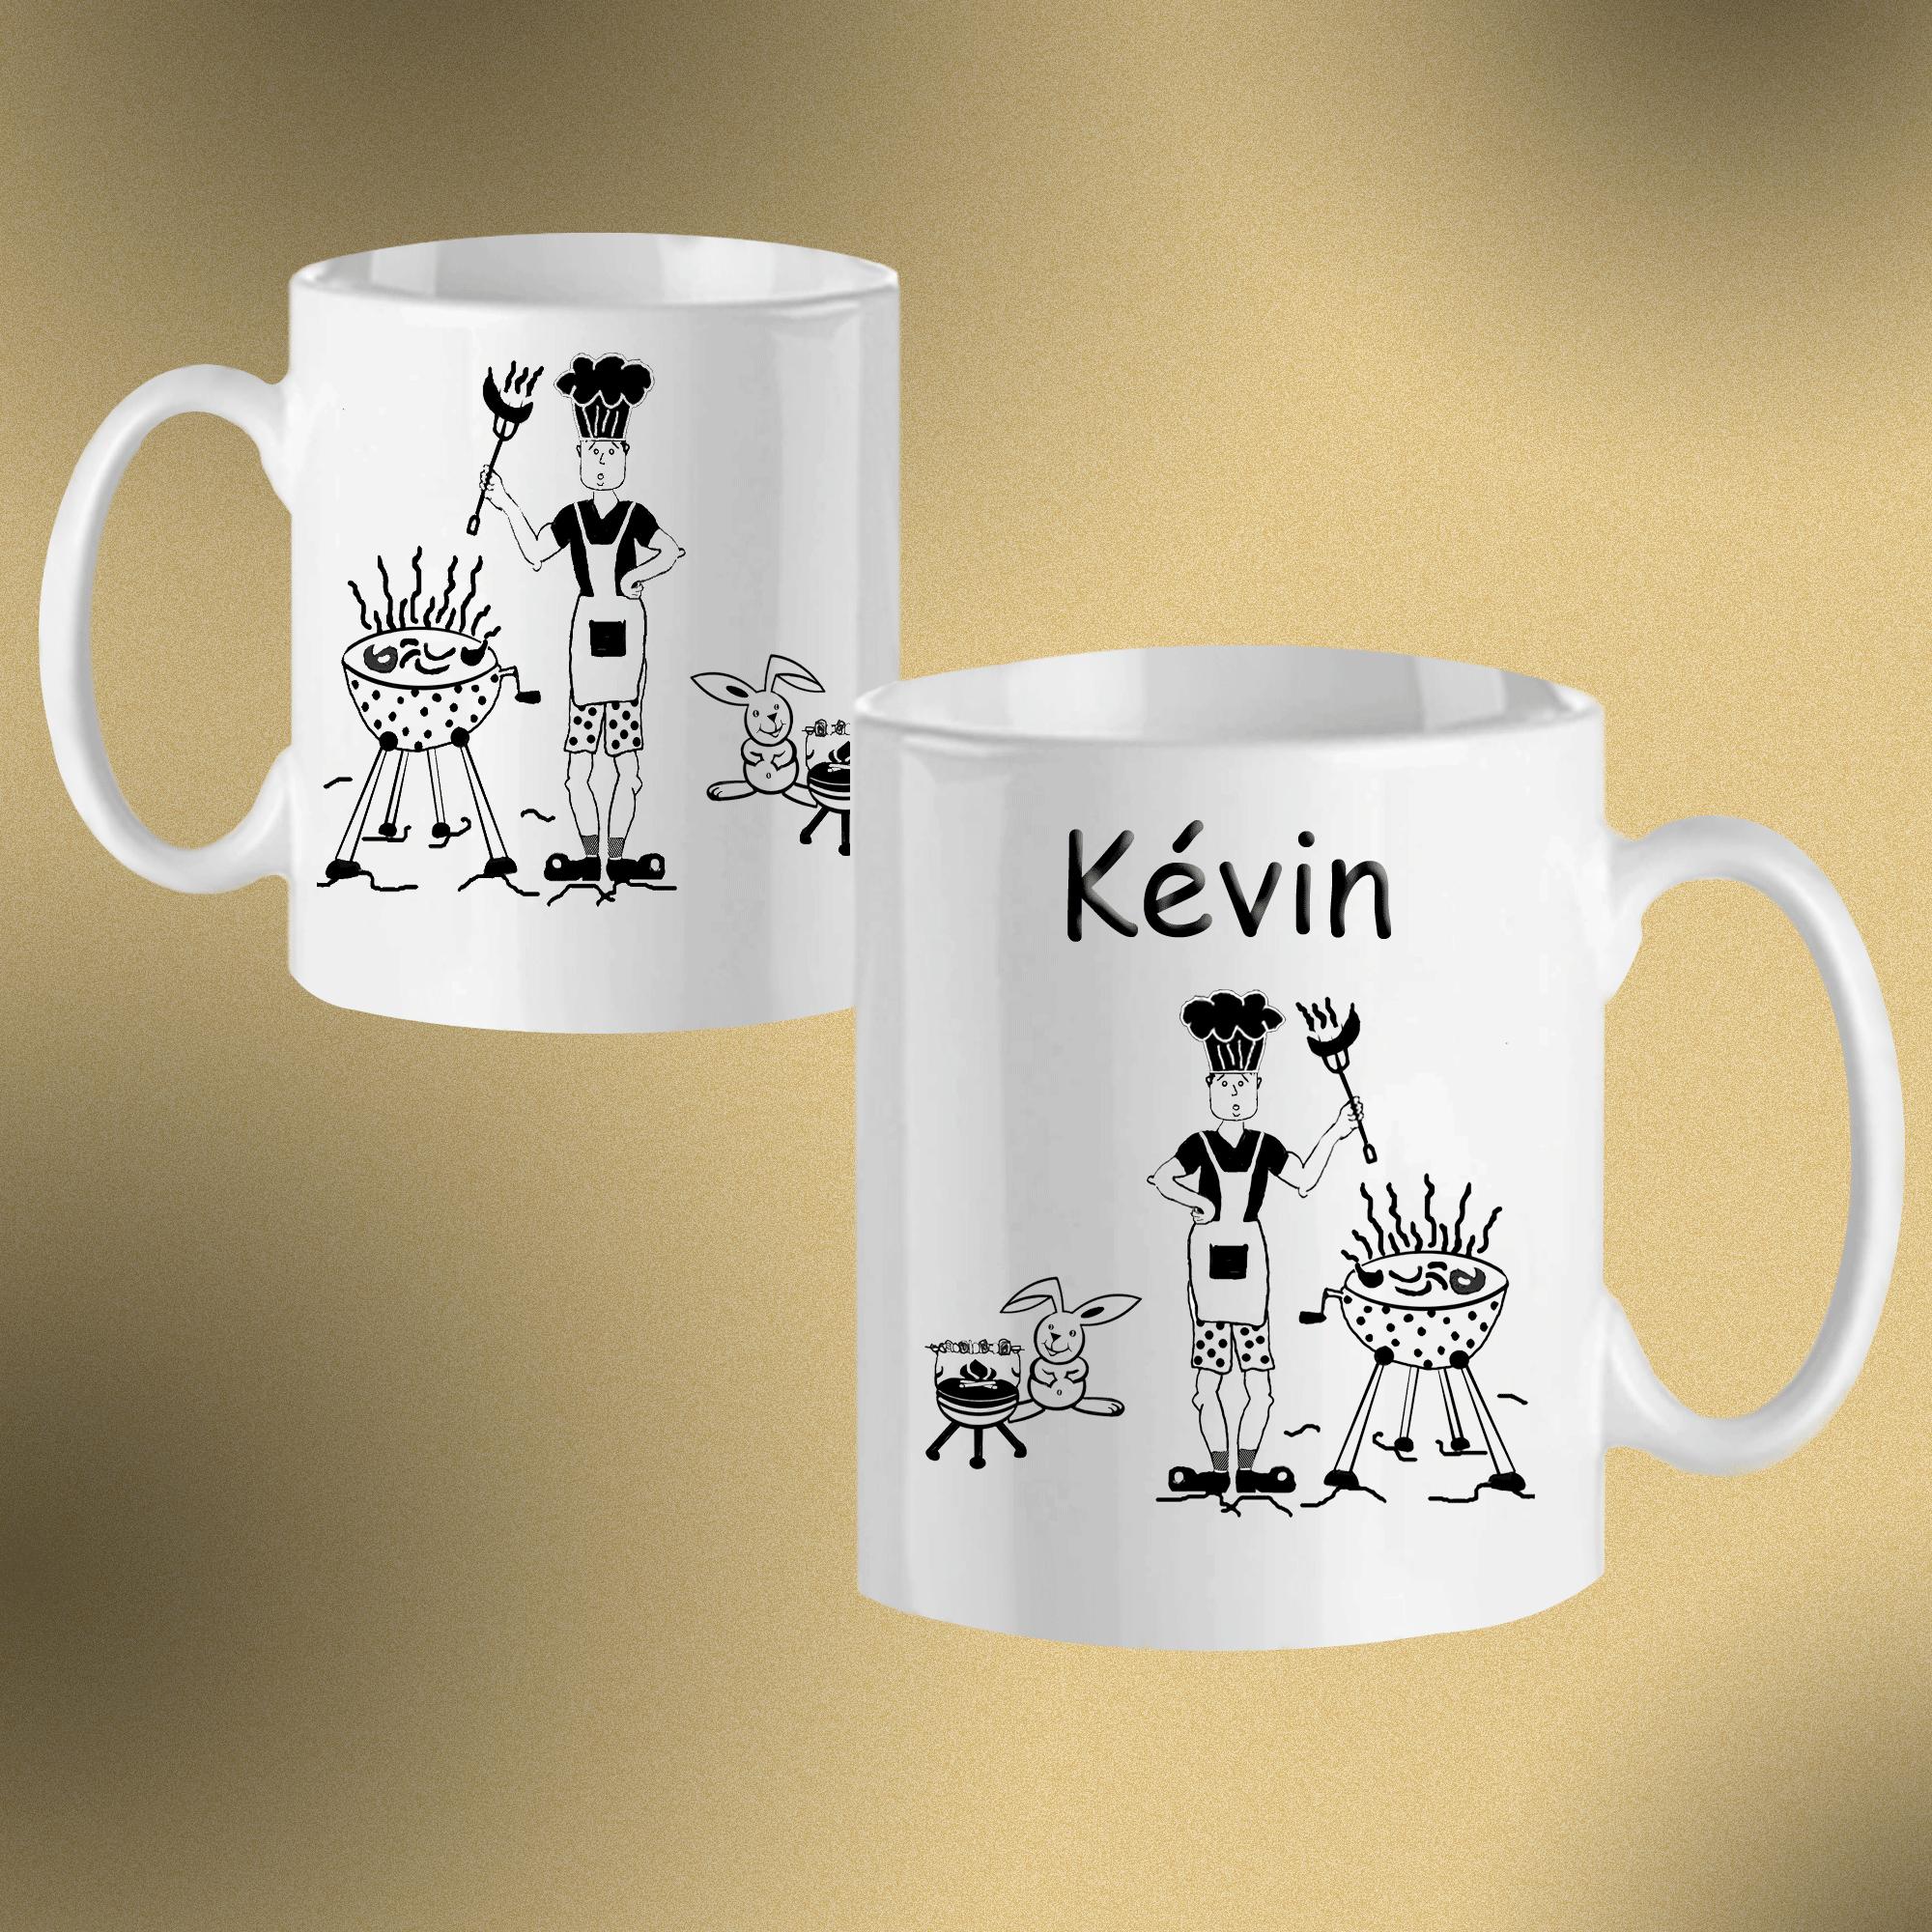 Mug Barbecue-personnalisé avec un prénom exemple Kévin